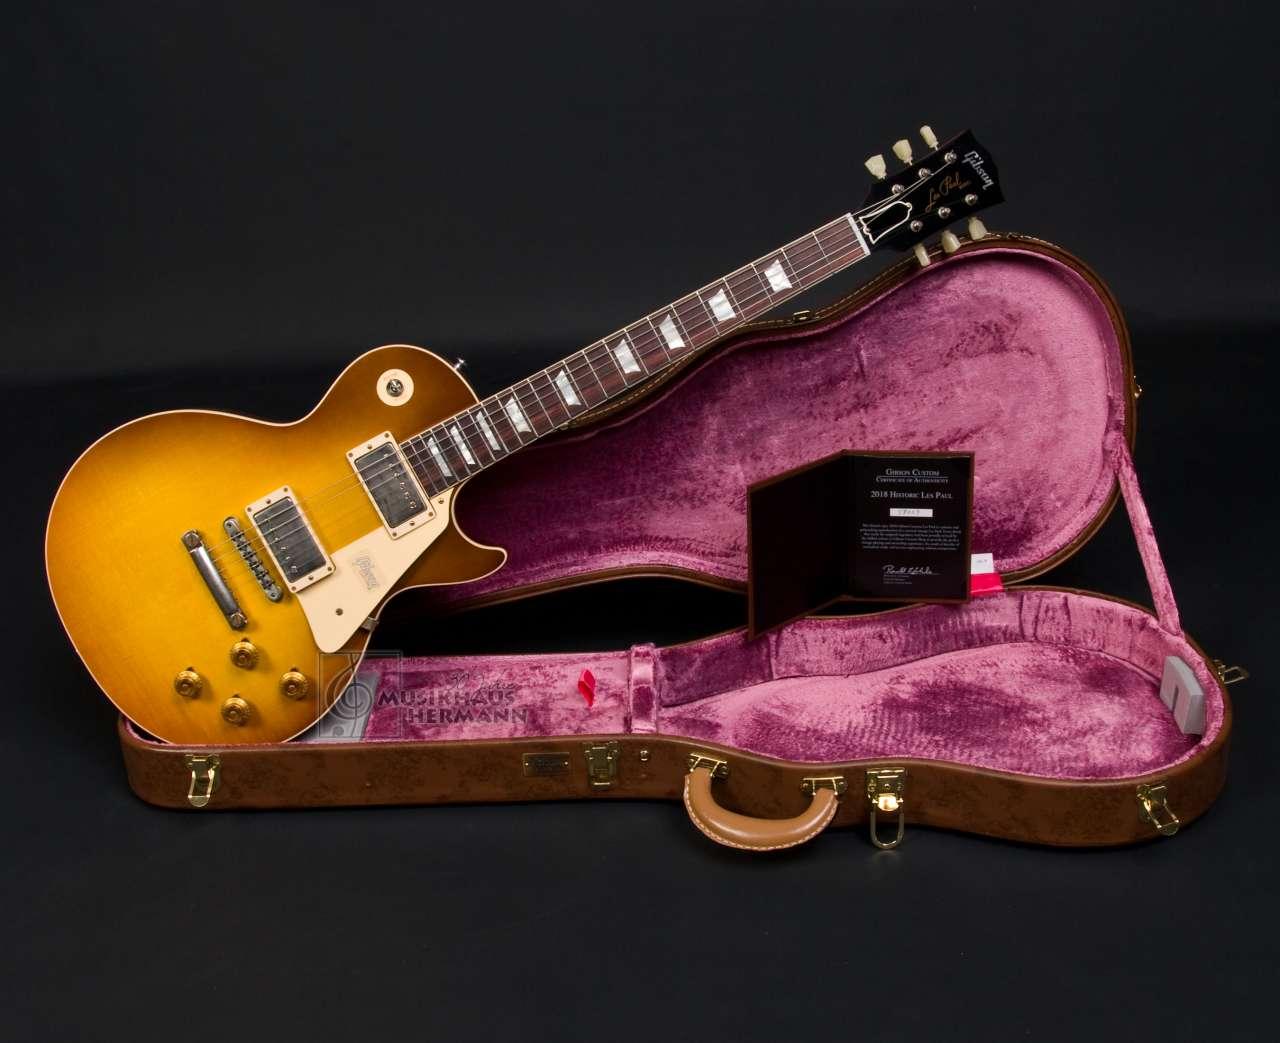 Gibson Les Paul 1958 Custom Historic 2018 - Royal Teaburst VOS LPR58VORYTNH1